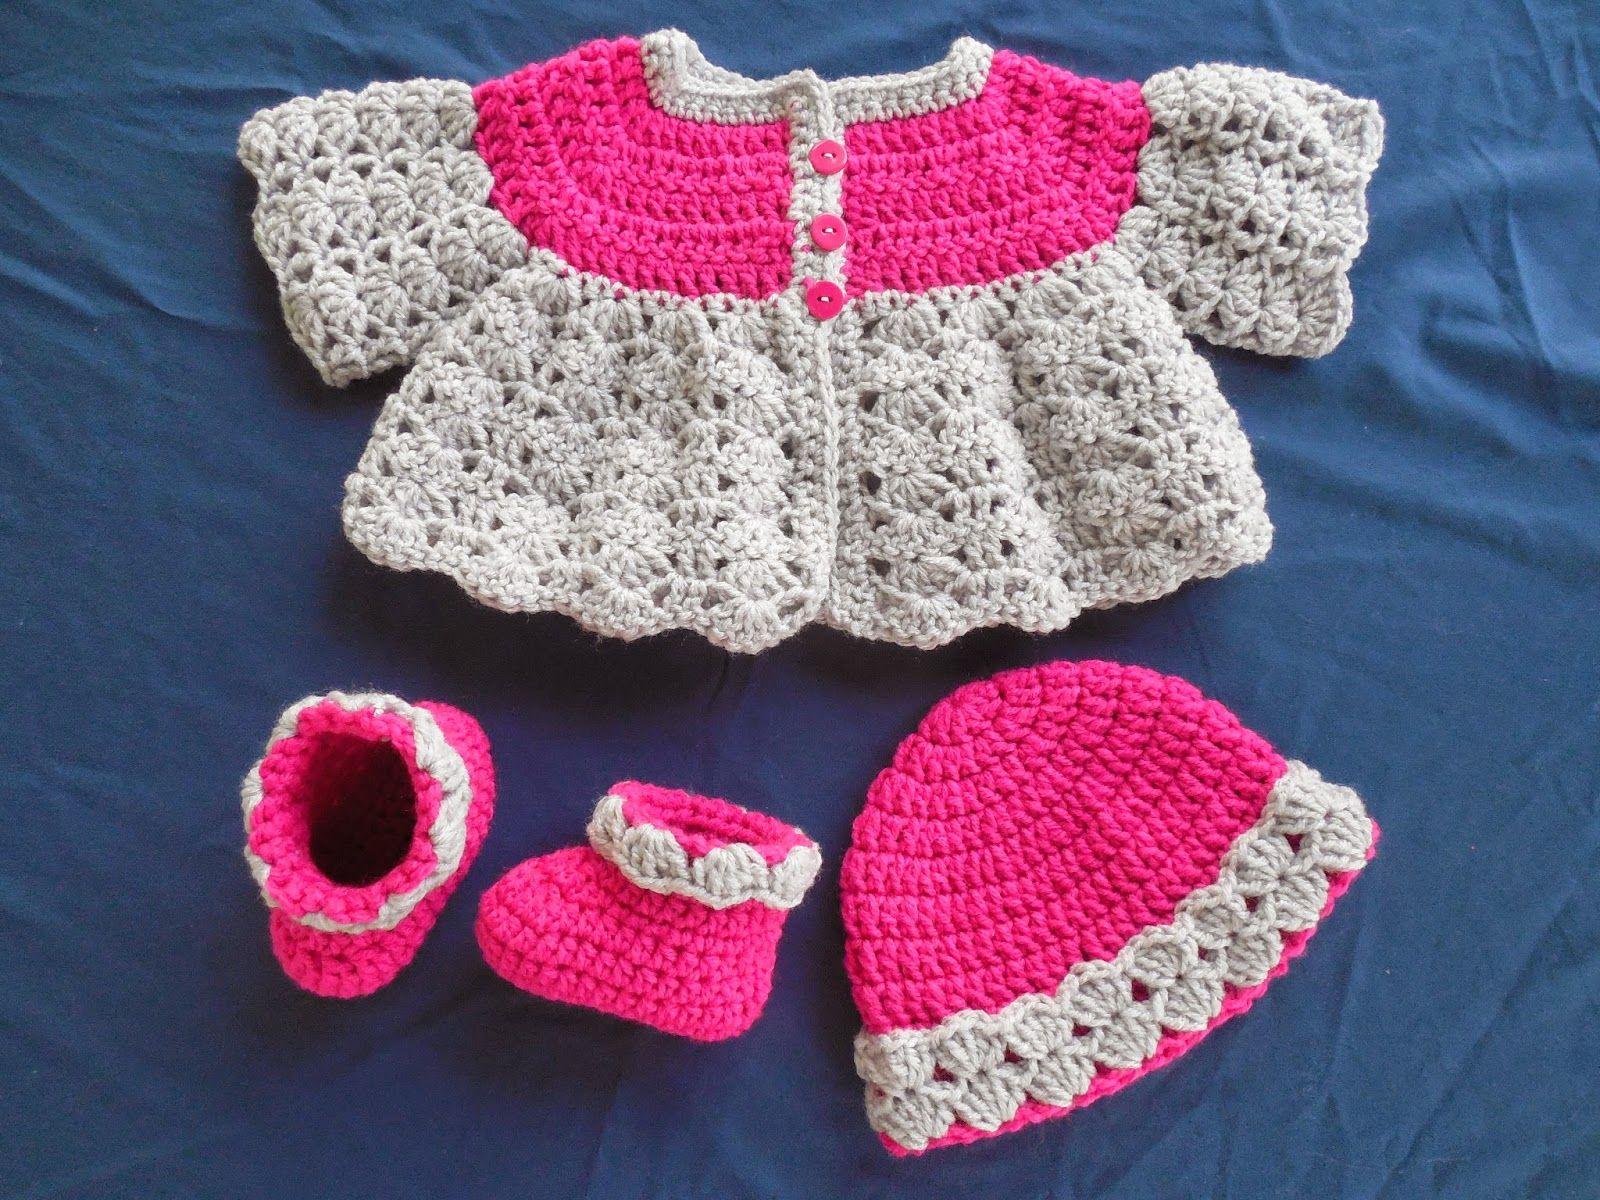 Britteny off the hook baby girls fancy shell sweater set 16 beautiful handmade baby gift sets with free crochet patternsdress bankloansurffo Choice Image